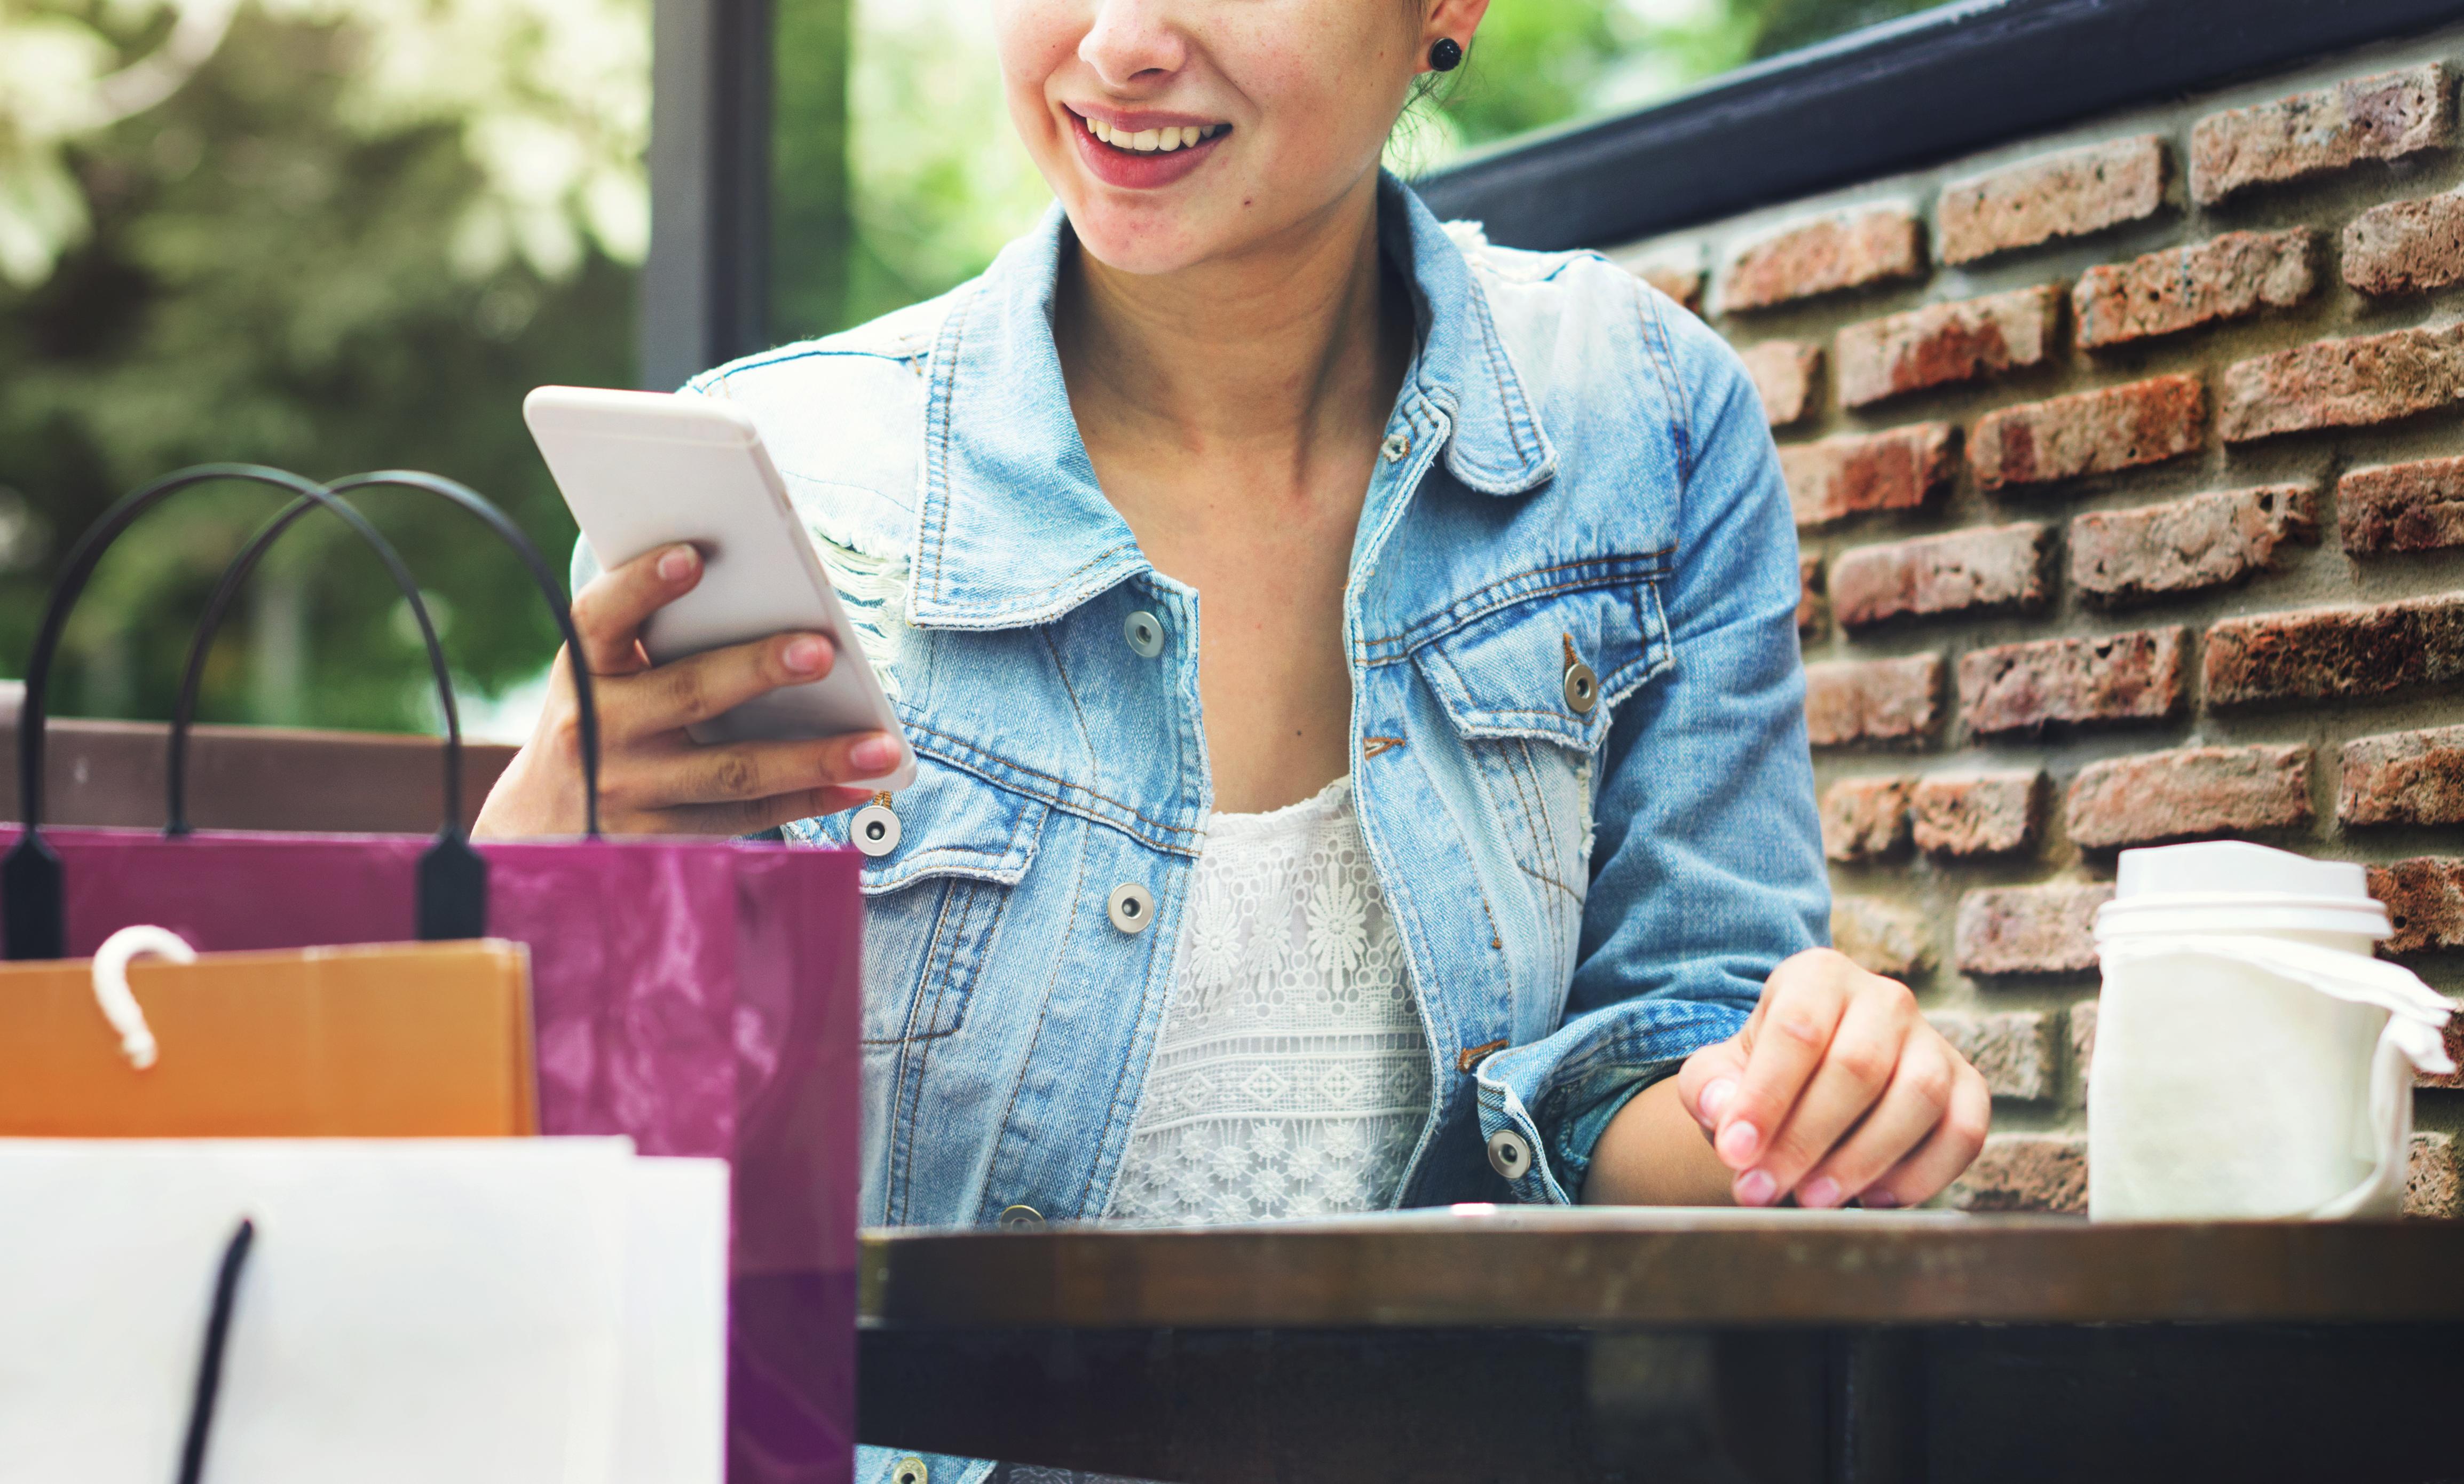 Woman Shopping Outdoor Mobile Phone Concept